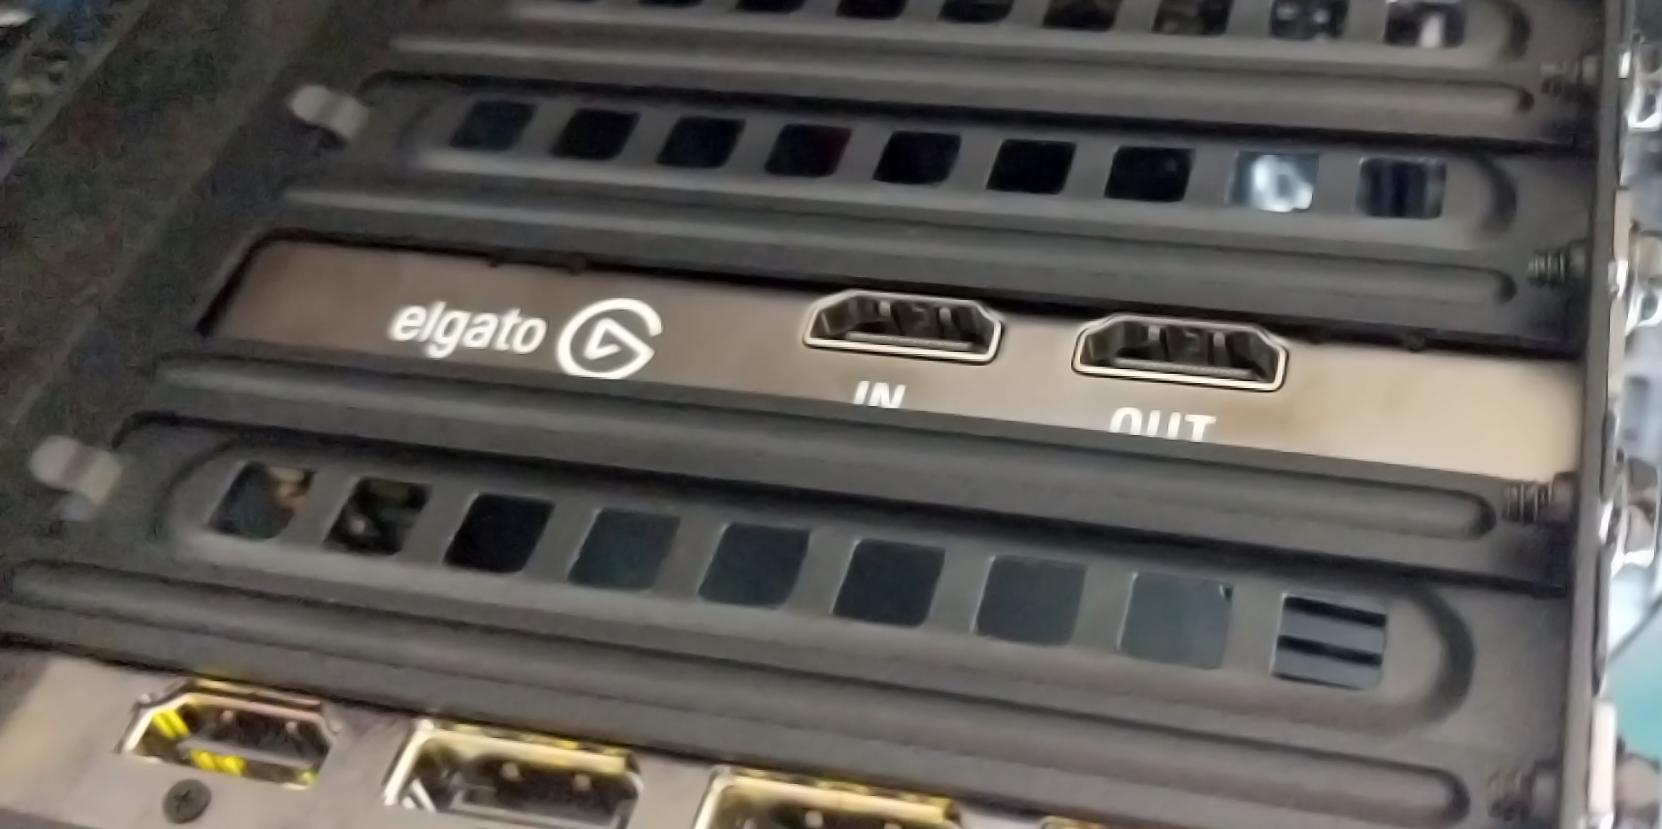 elgato+4k60PRO+capture+card+HDMI+PCIE.png